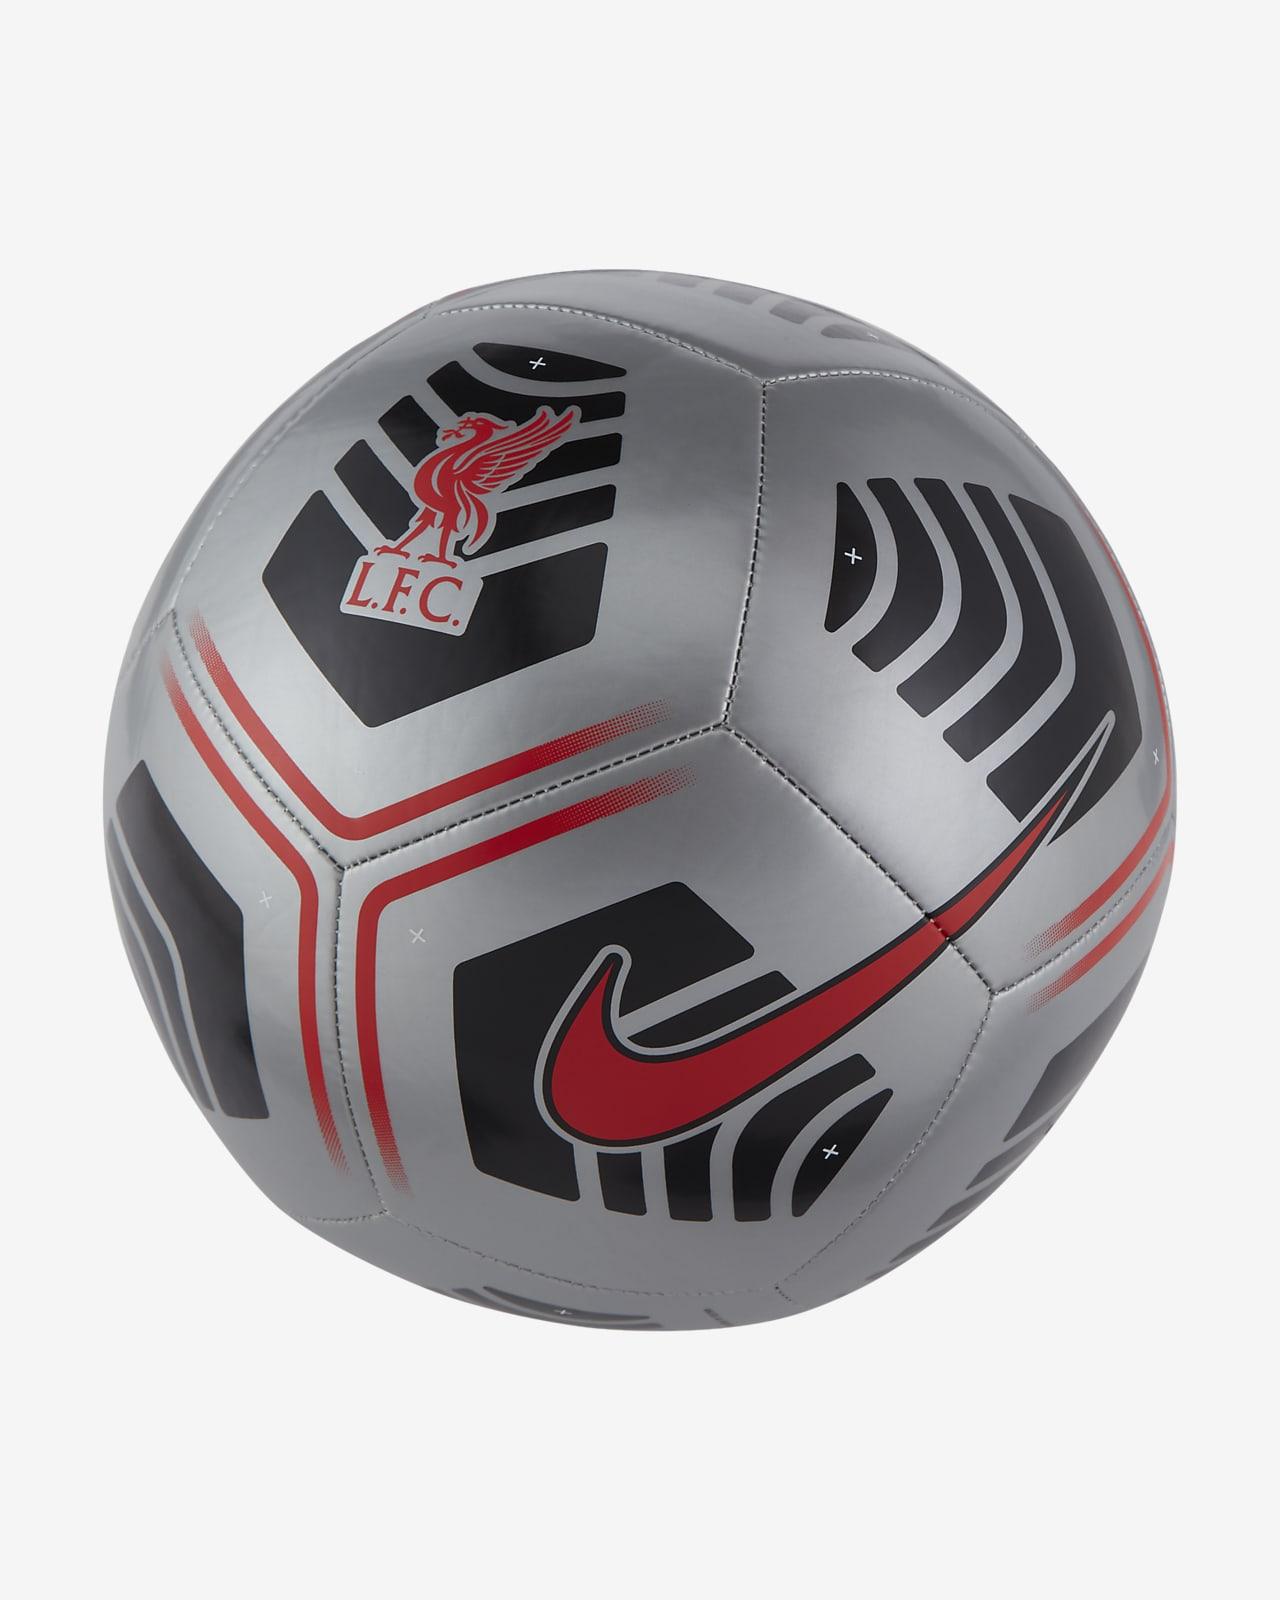 Ballon de football Liverpool FC Pitch